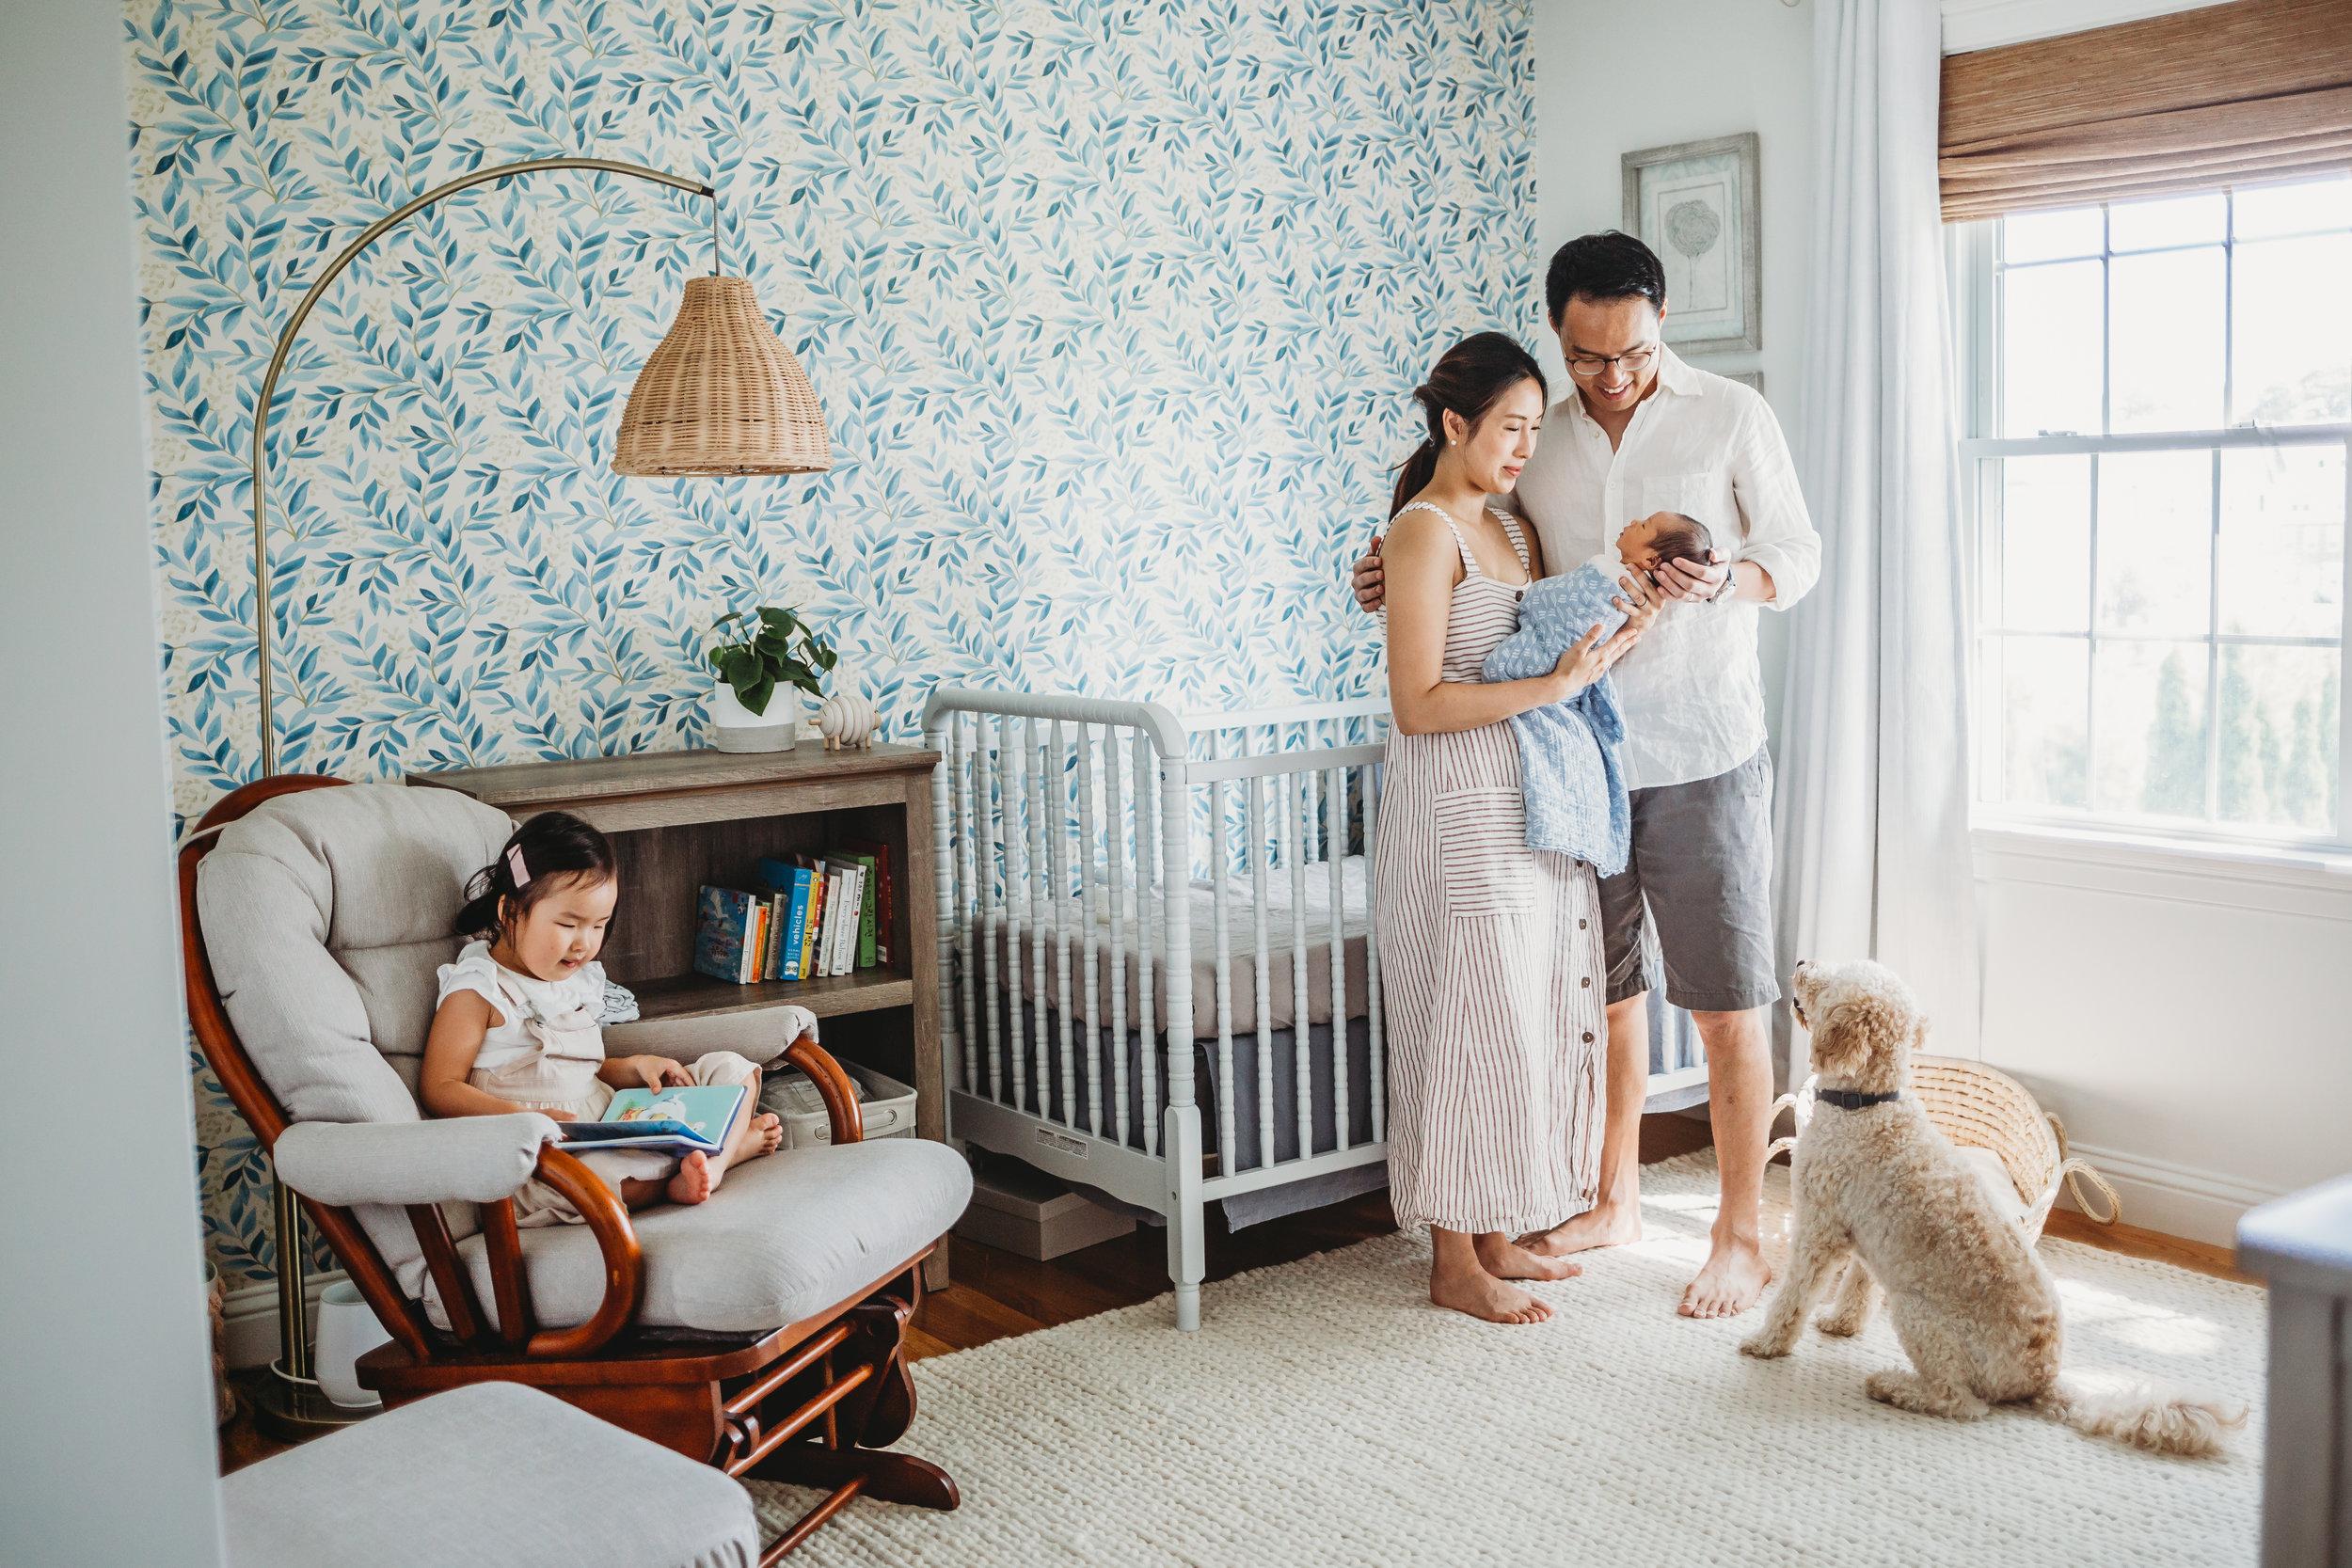 In-Home Newborn Photography Session in Framingham, Massachusetts